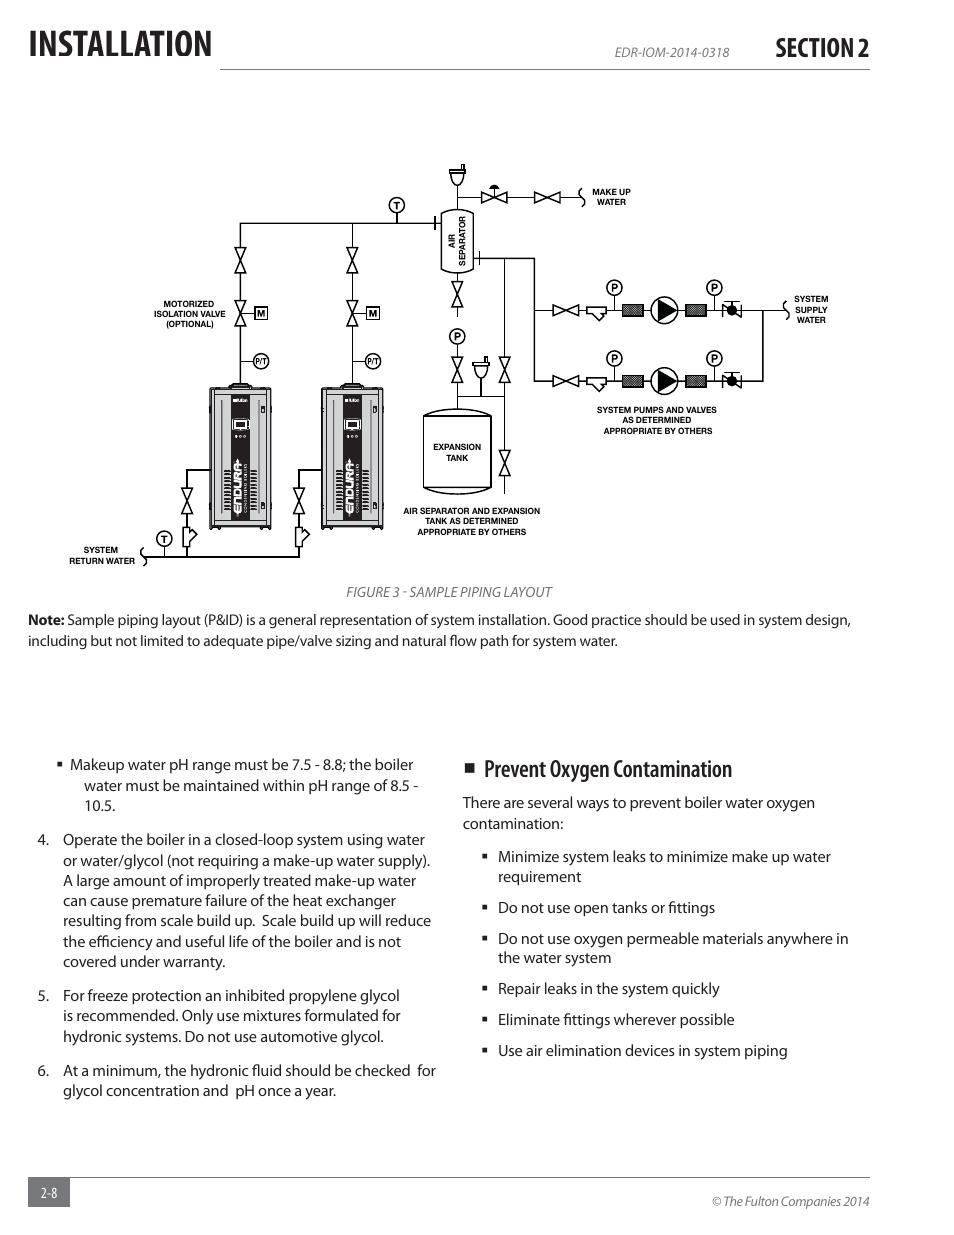 medium resolution of installation prevent oxygen contamination fulton endura edr condensing hydronic boiler user manual page 14 68